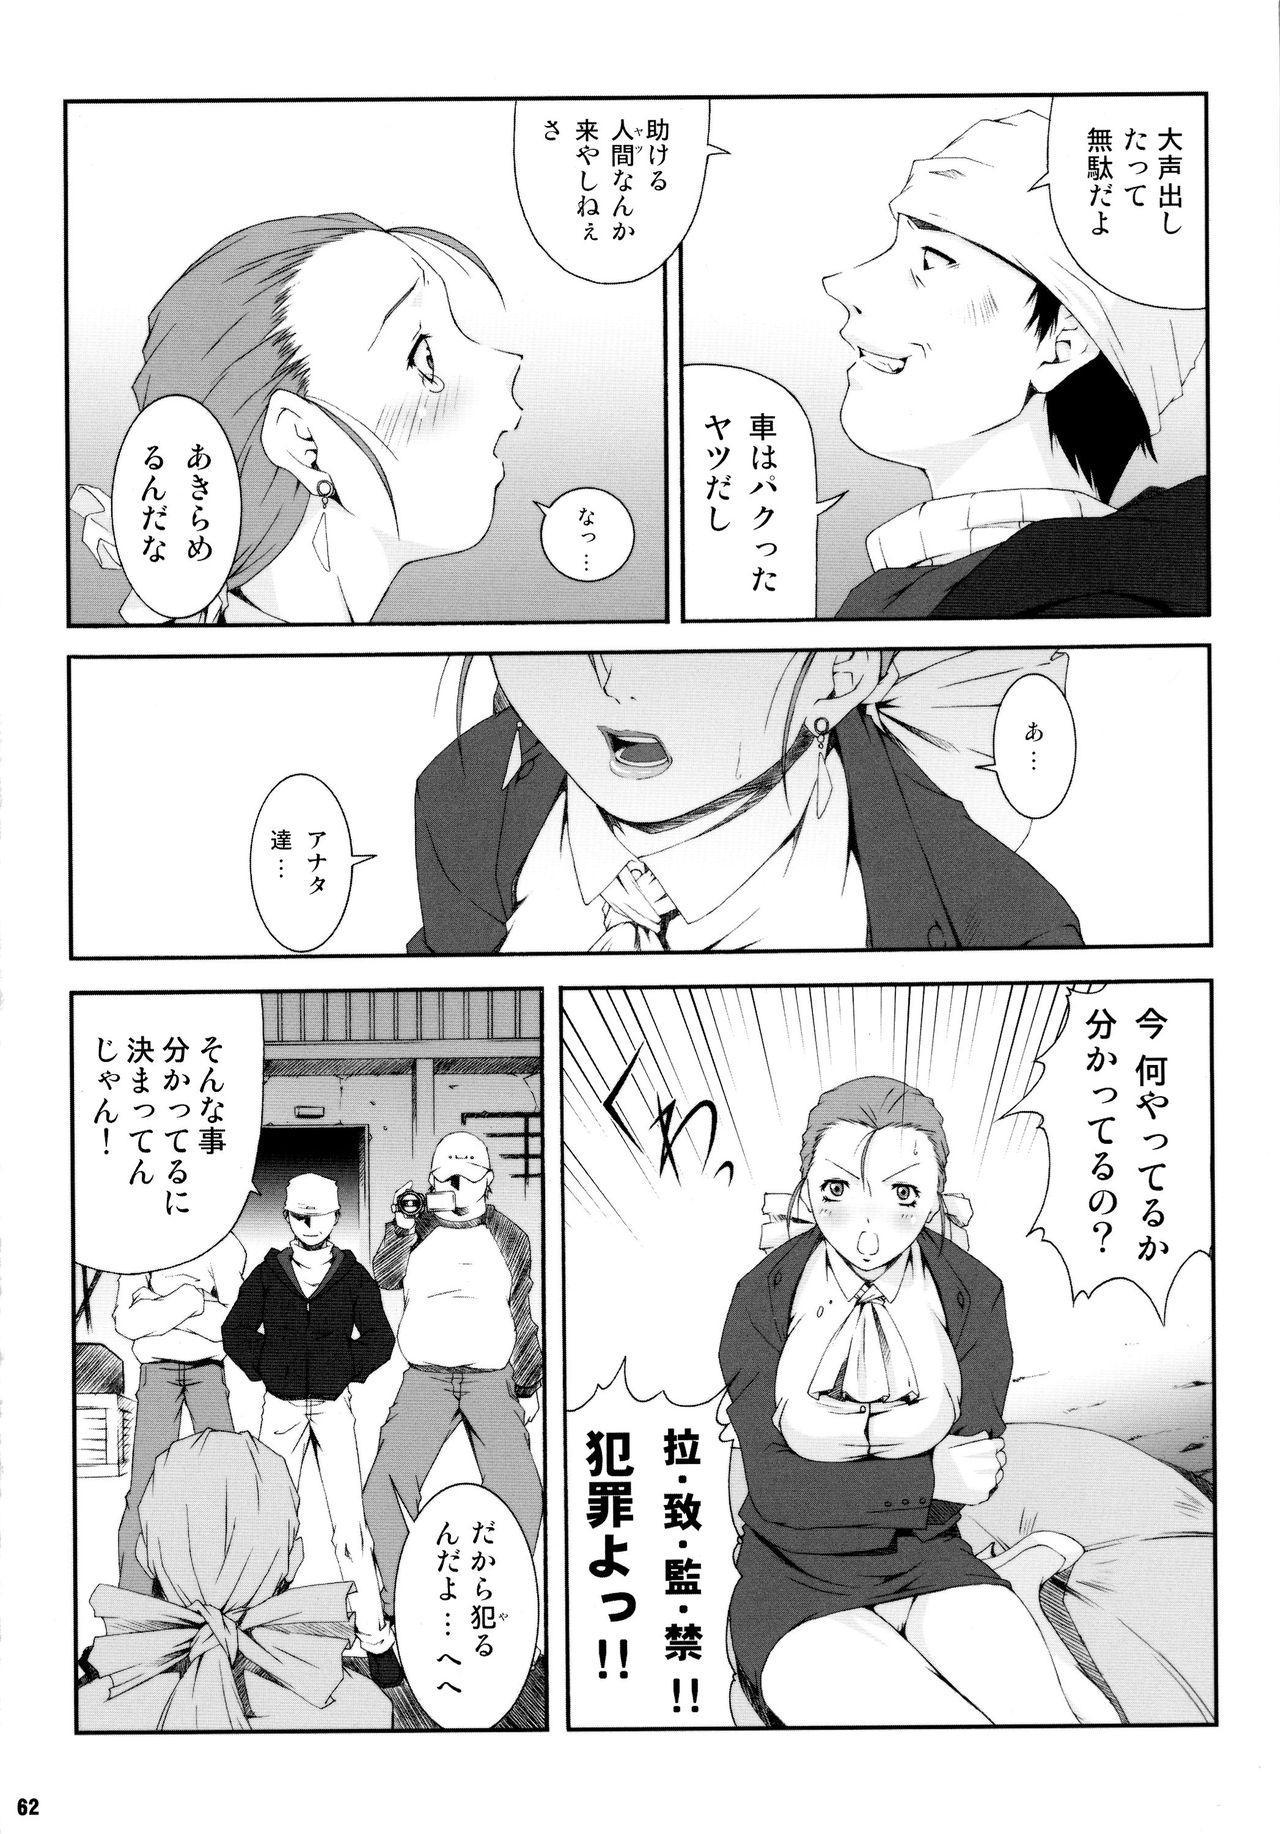 Misoka no 5 61